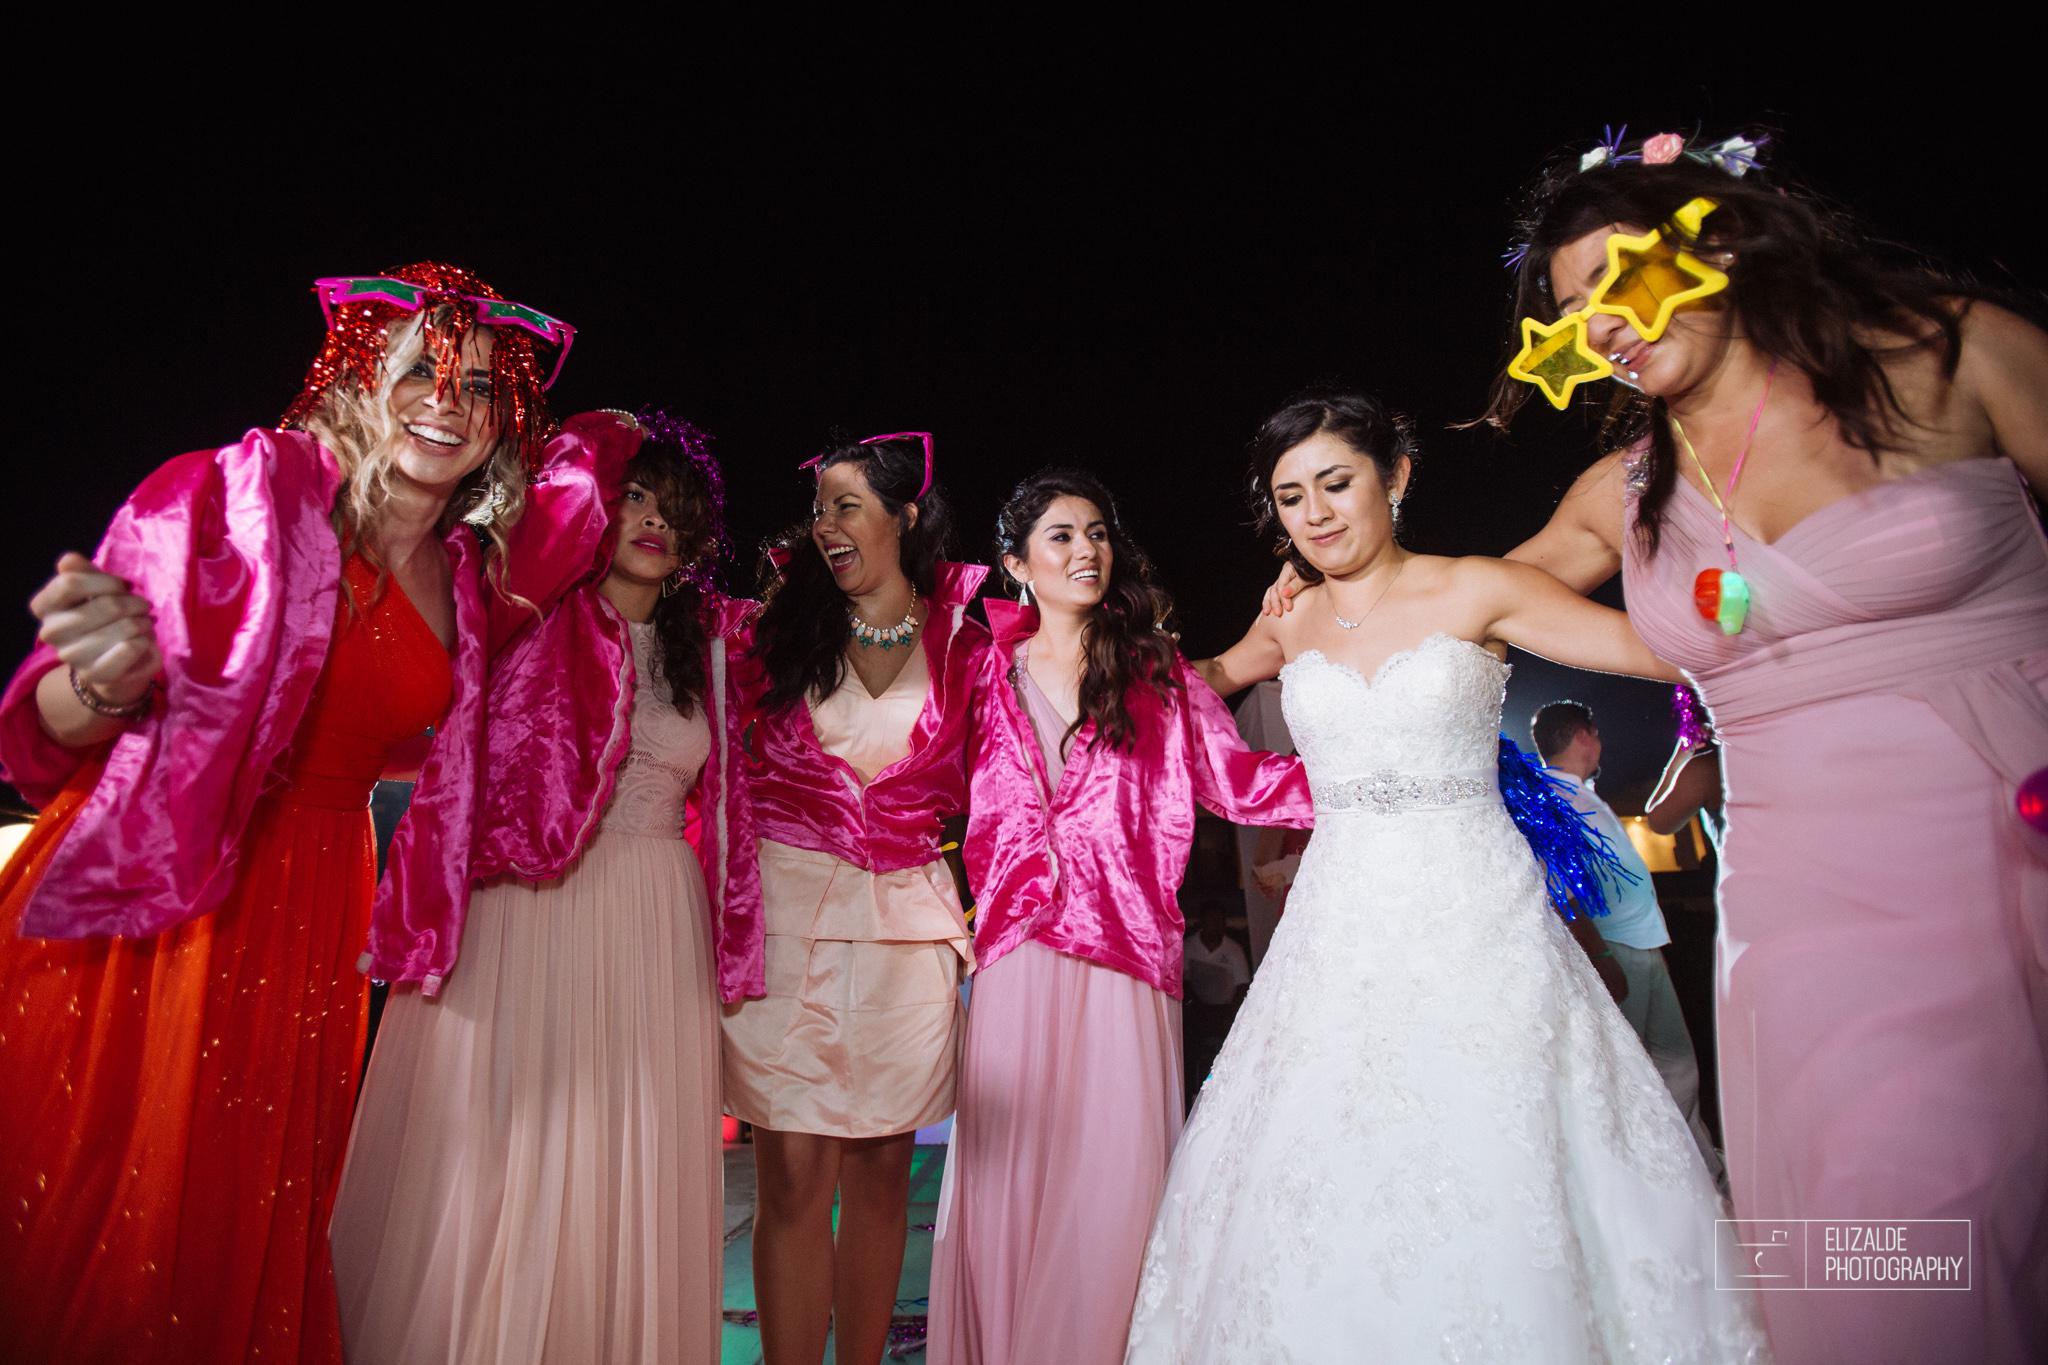 Pay and Ferran_Acapulco_Destination Wedding_Elizalde Photography-148.jpg